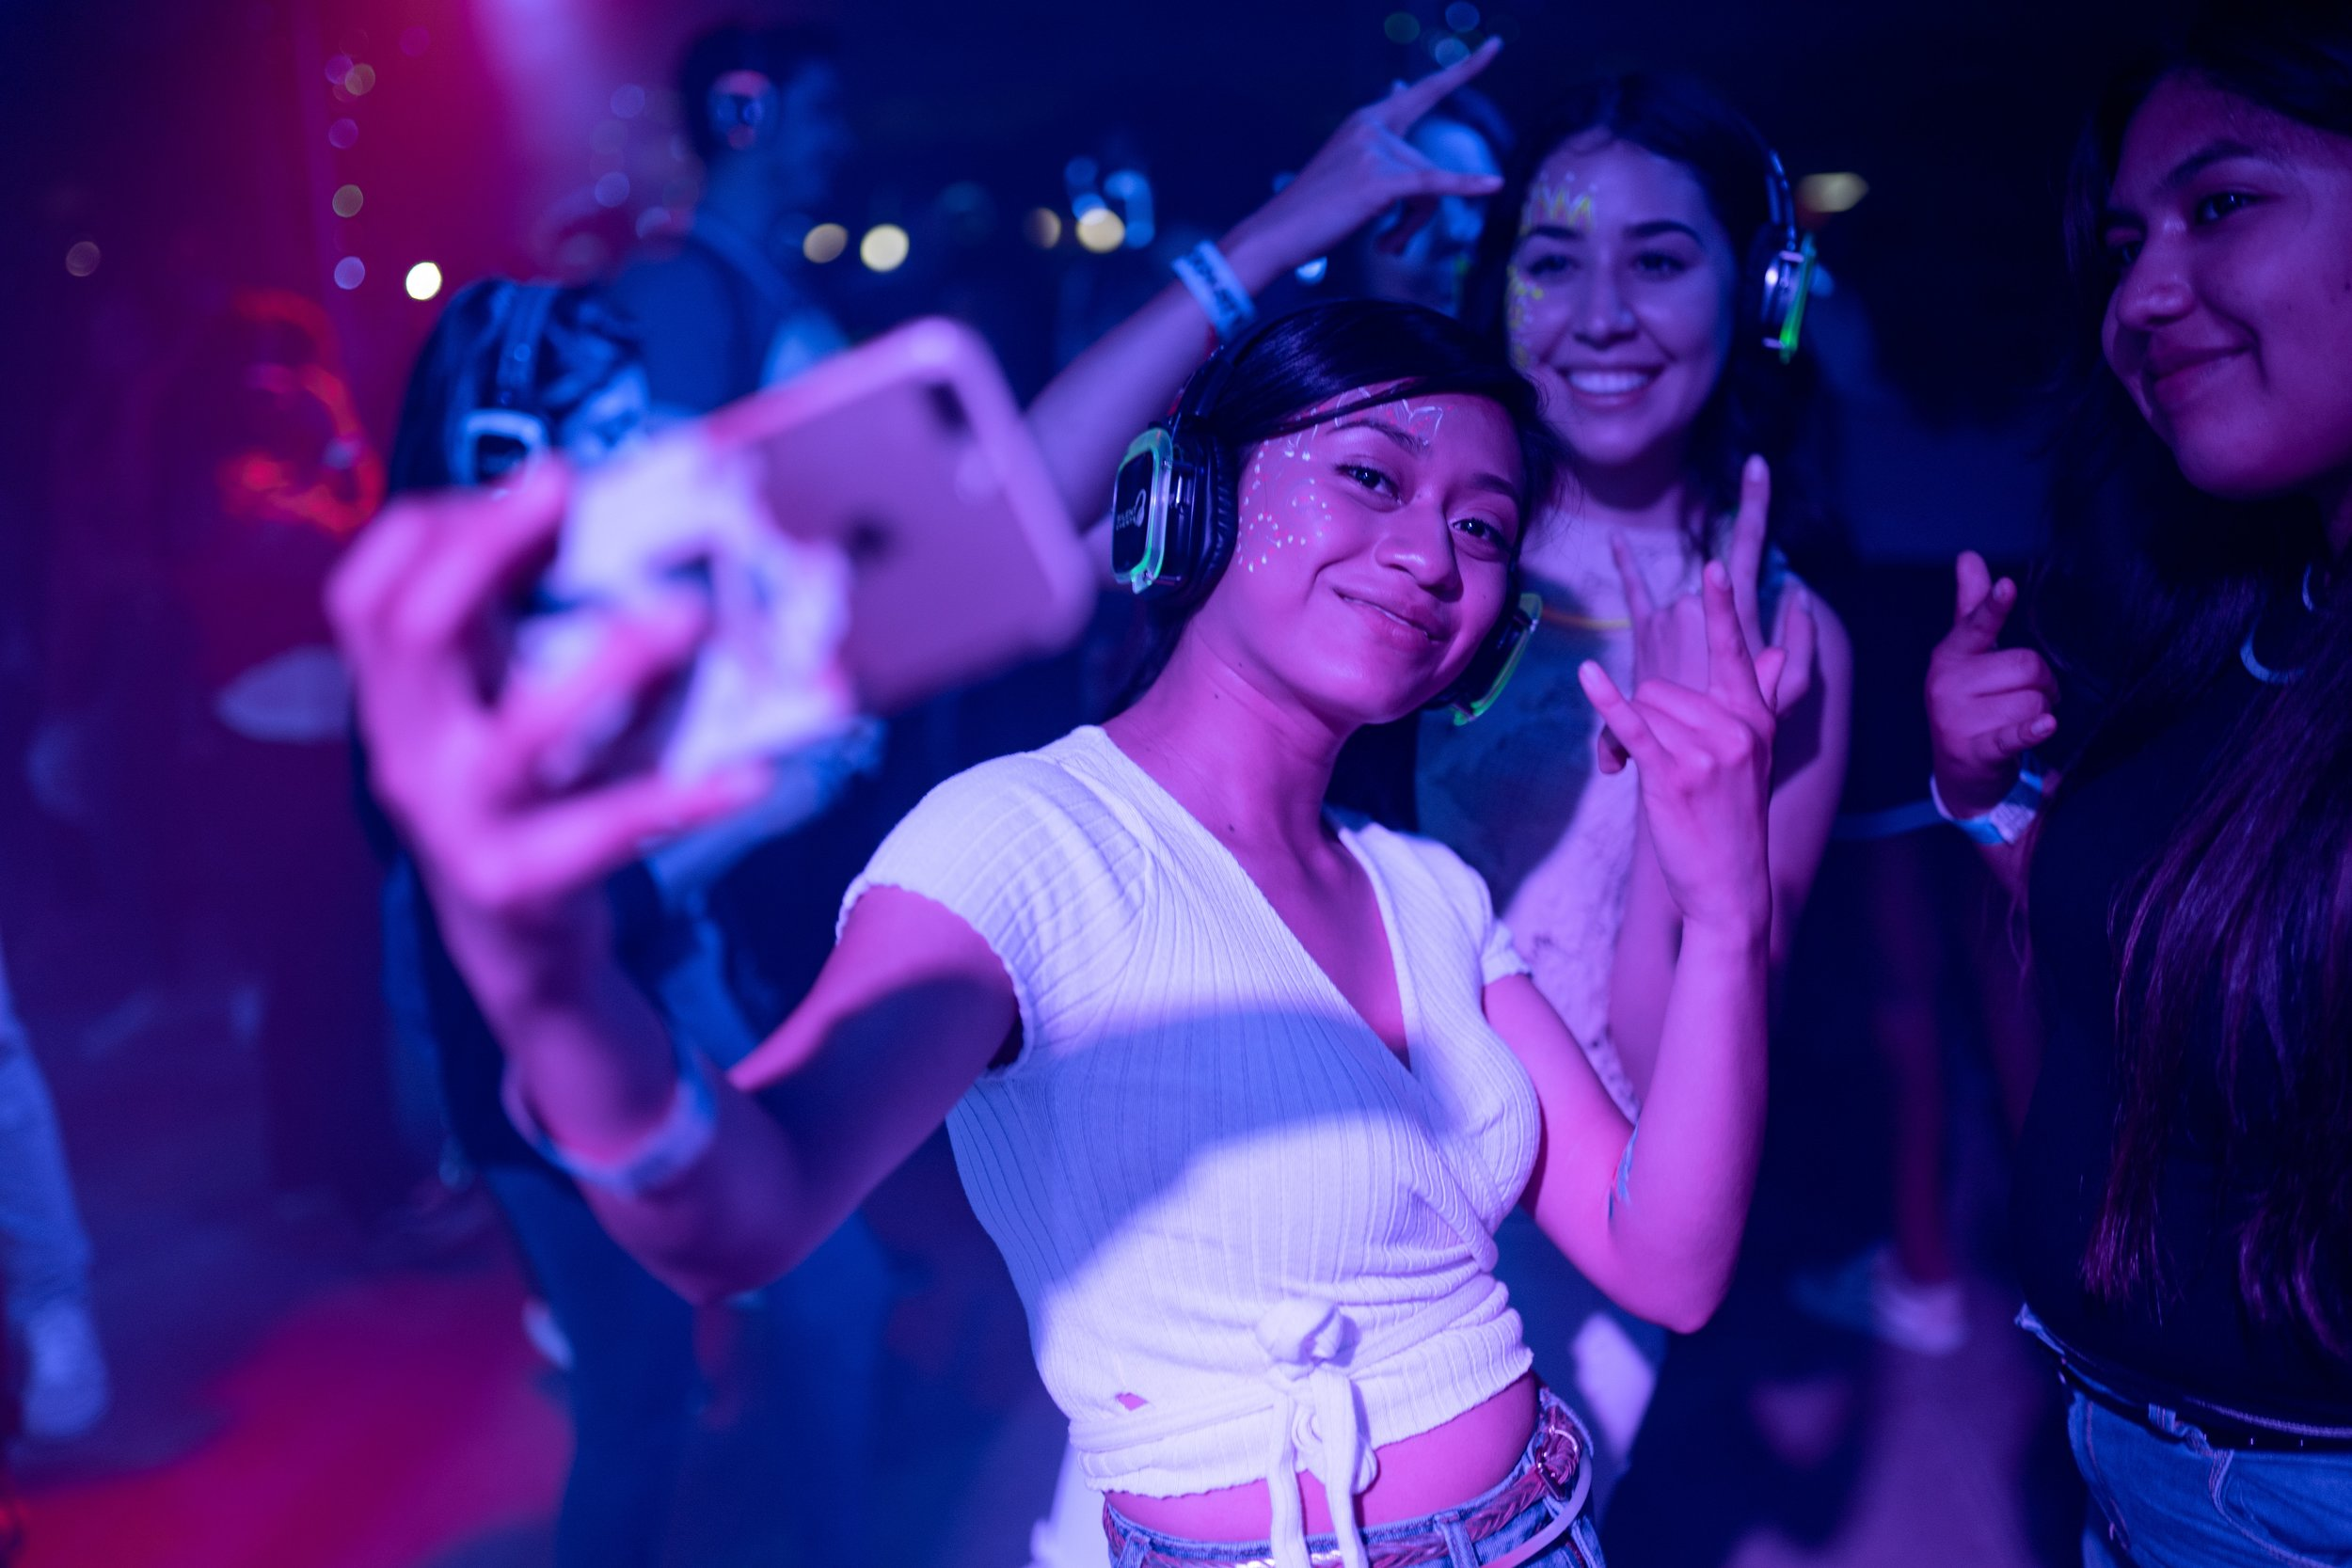 band-celebration-club-2240763.jpg